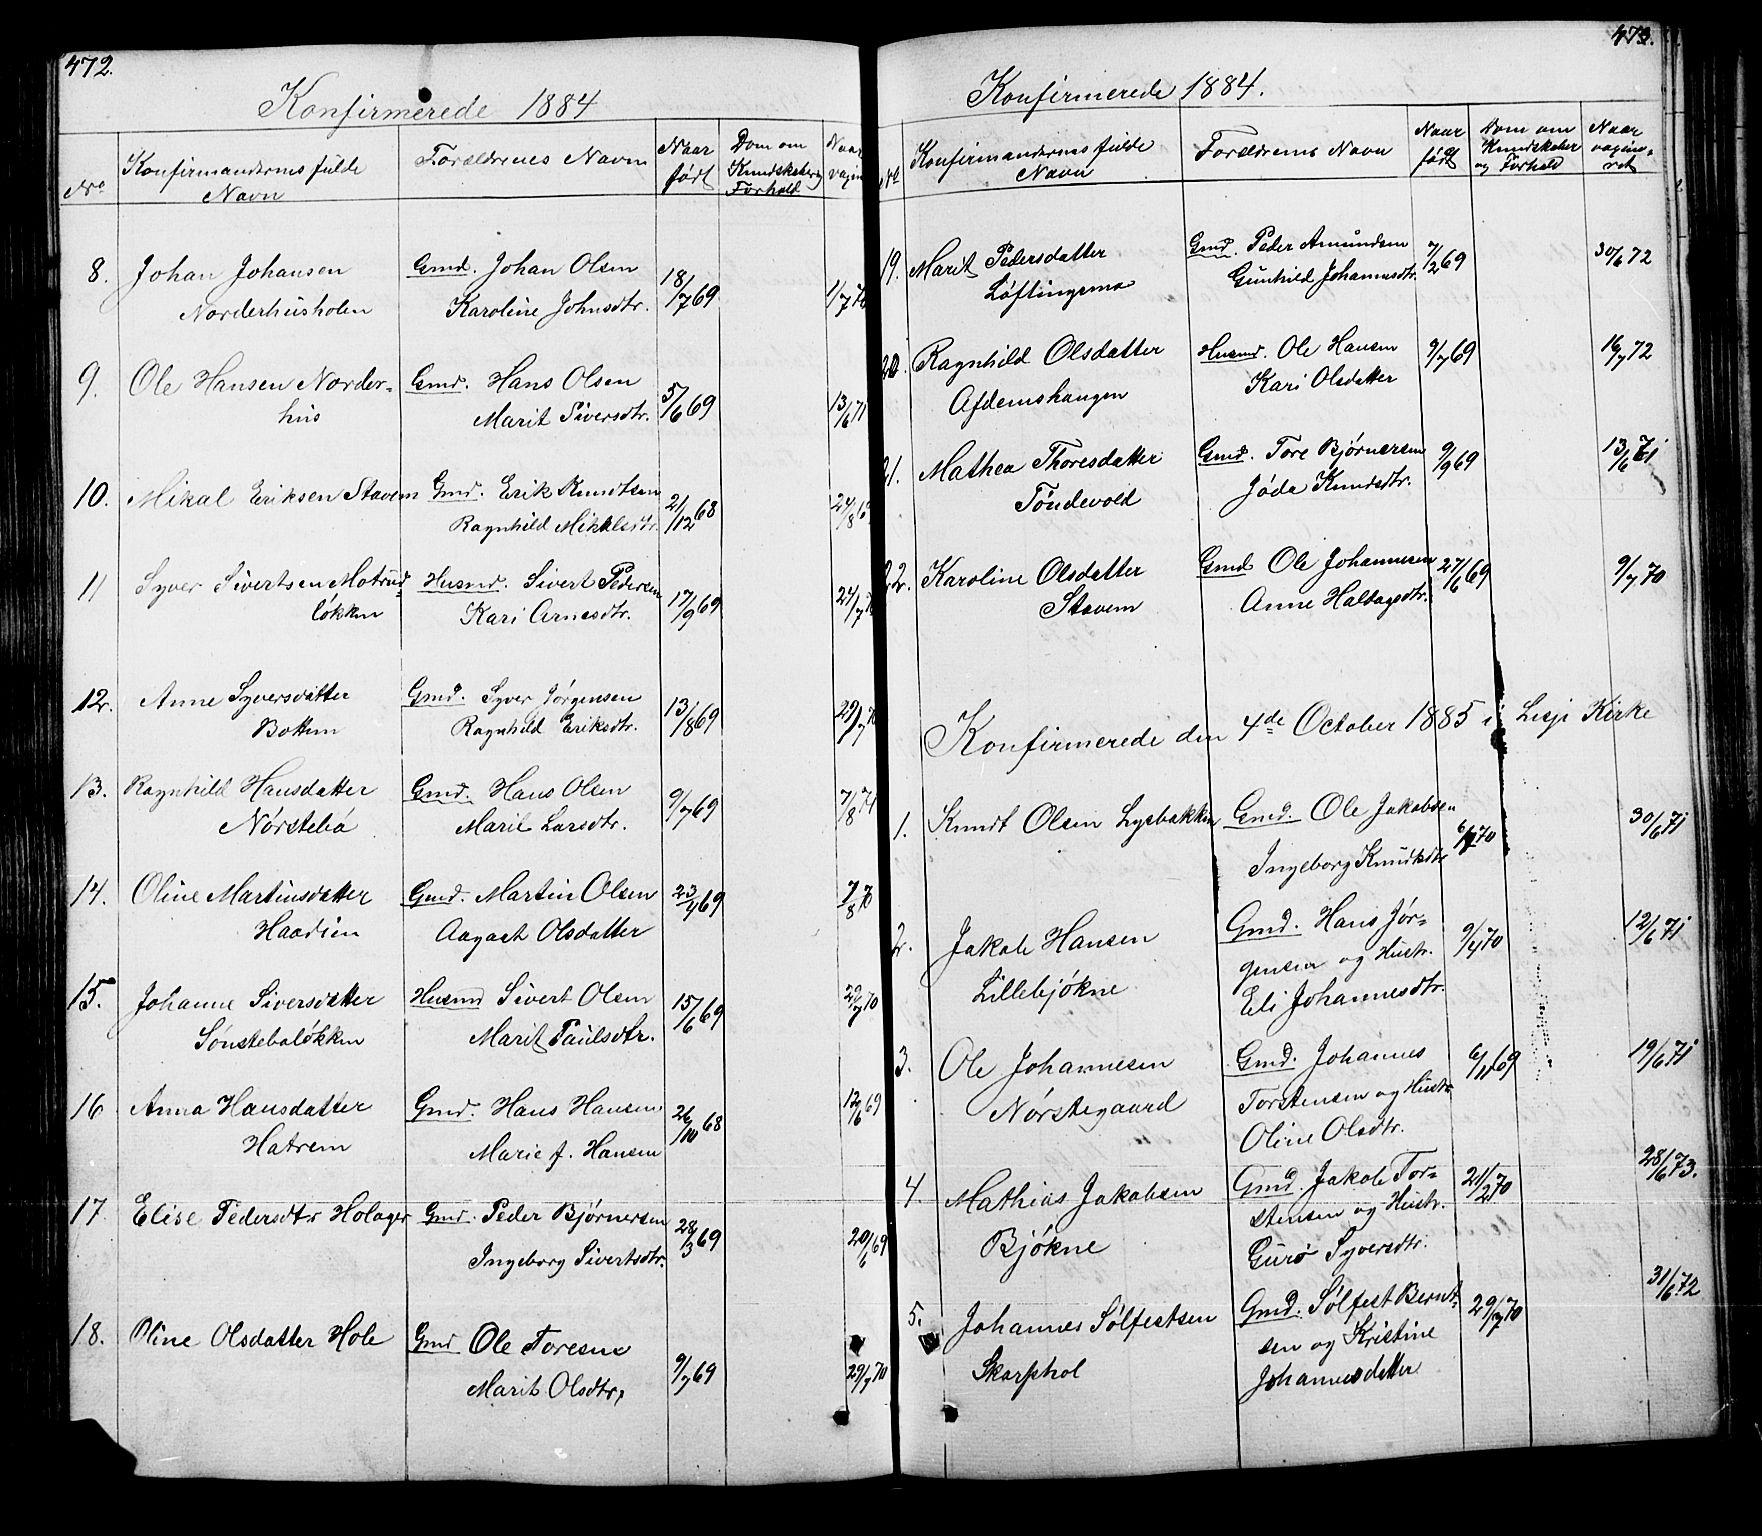 SAH, Lesja prestekontor, Klokkerbok nr. 5, 1850-1894, s. 472-473